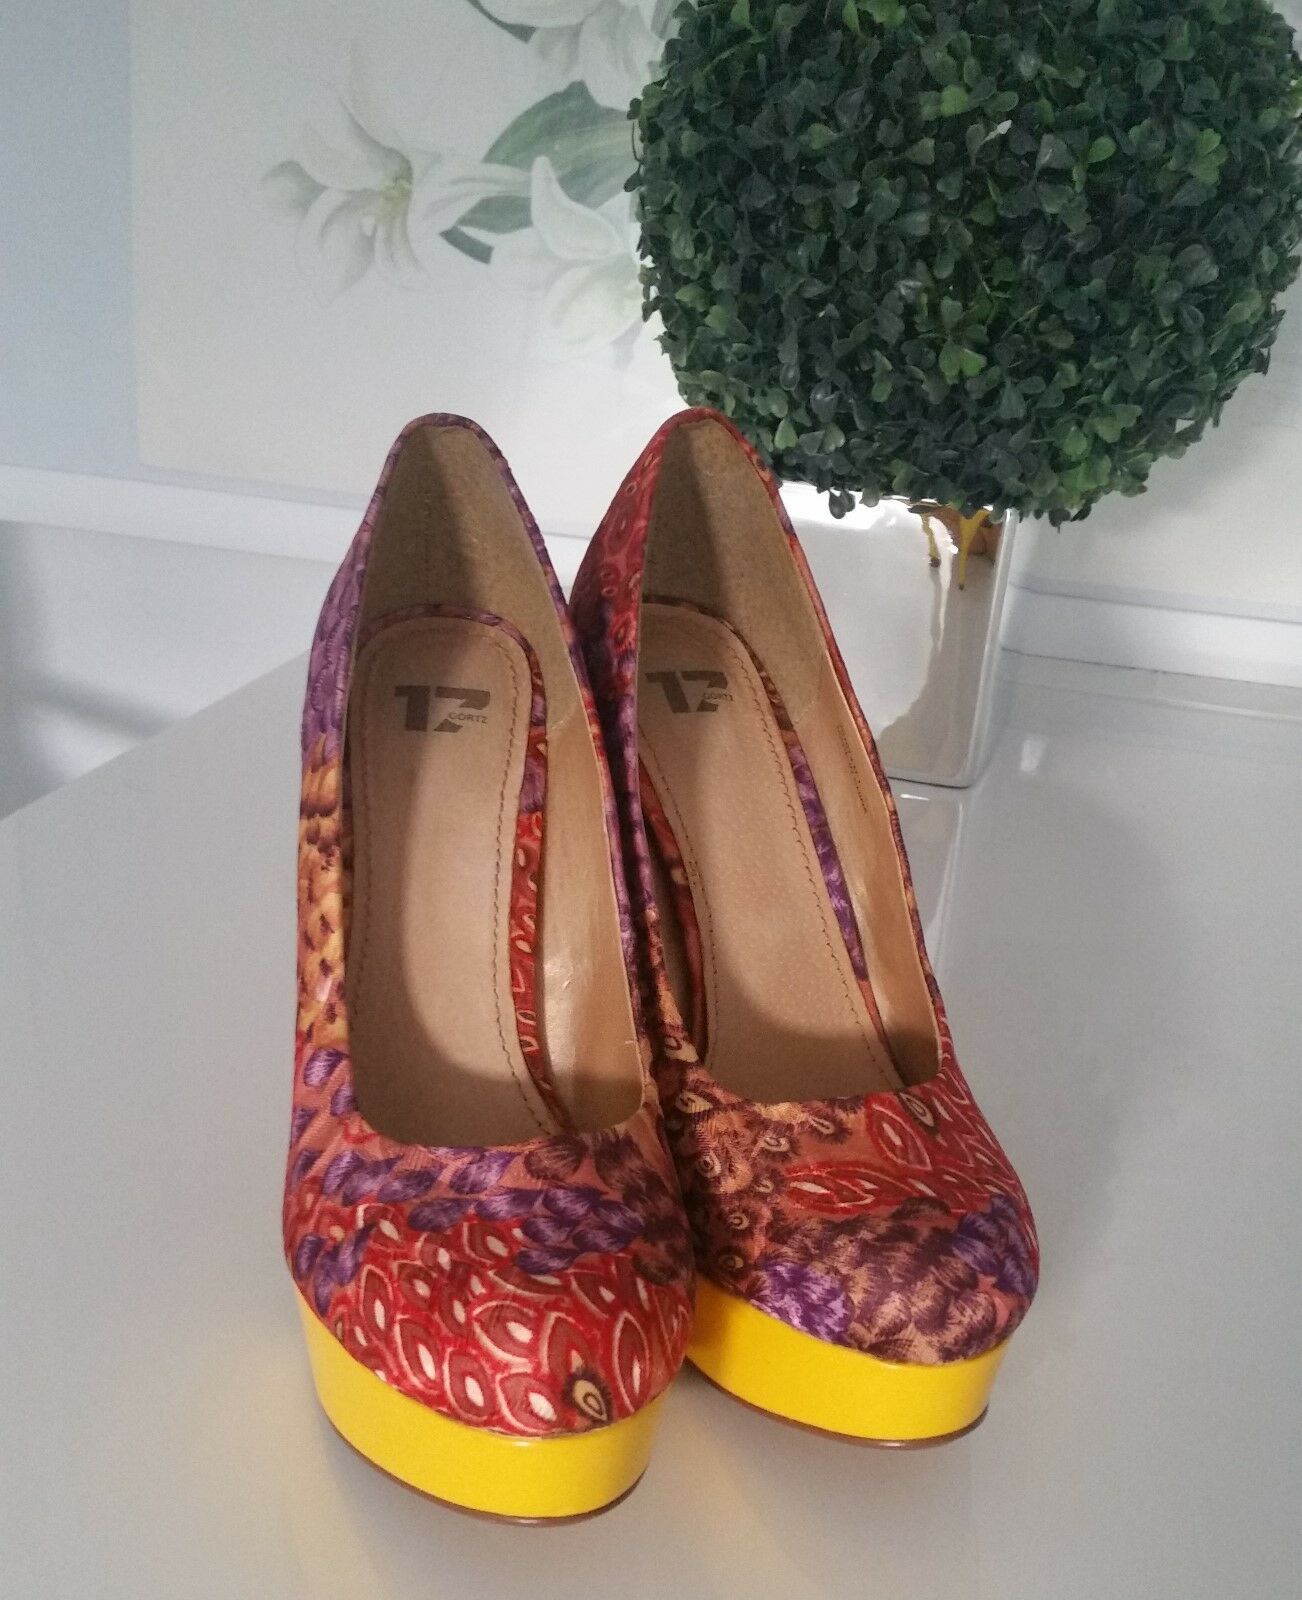 Sexy Damen High Heels - Pumps - Görtz 17 - Gr. 41 - mehrfarbig